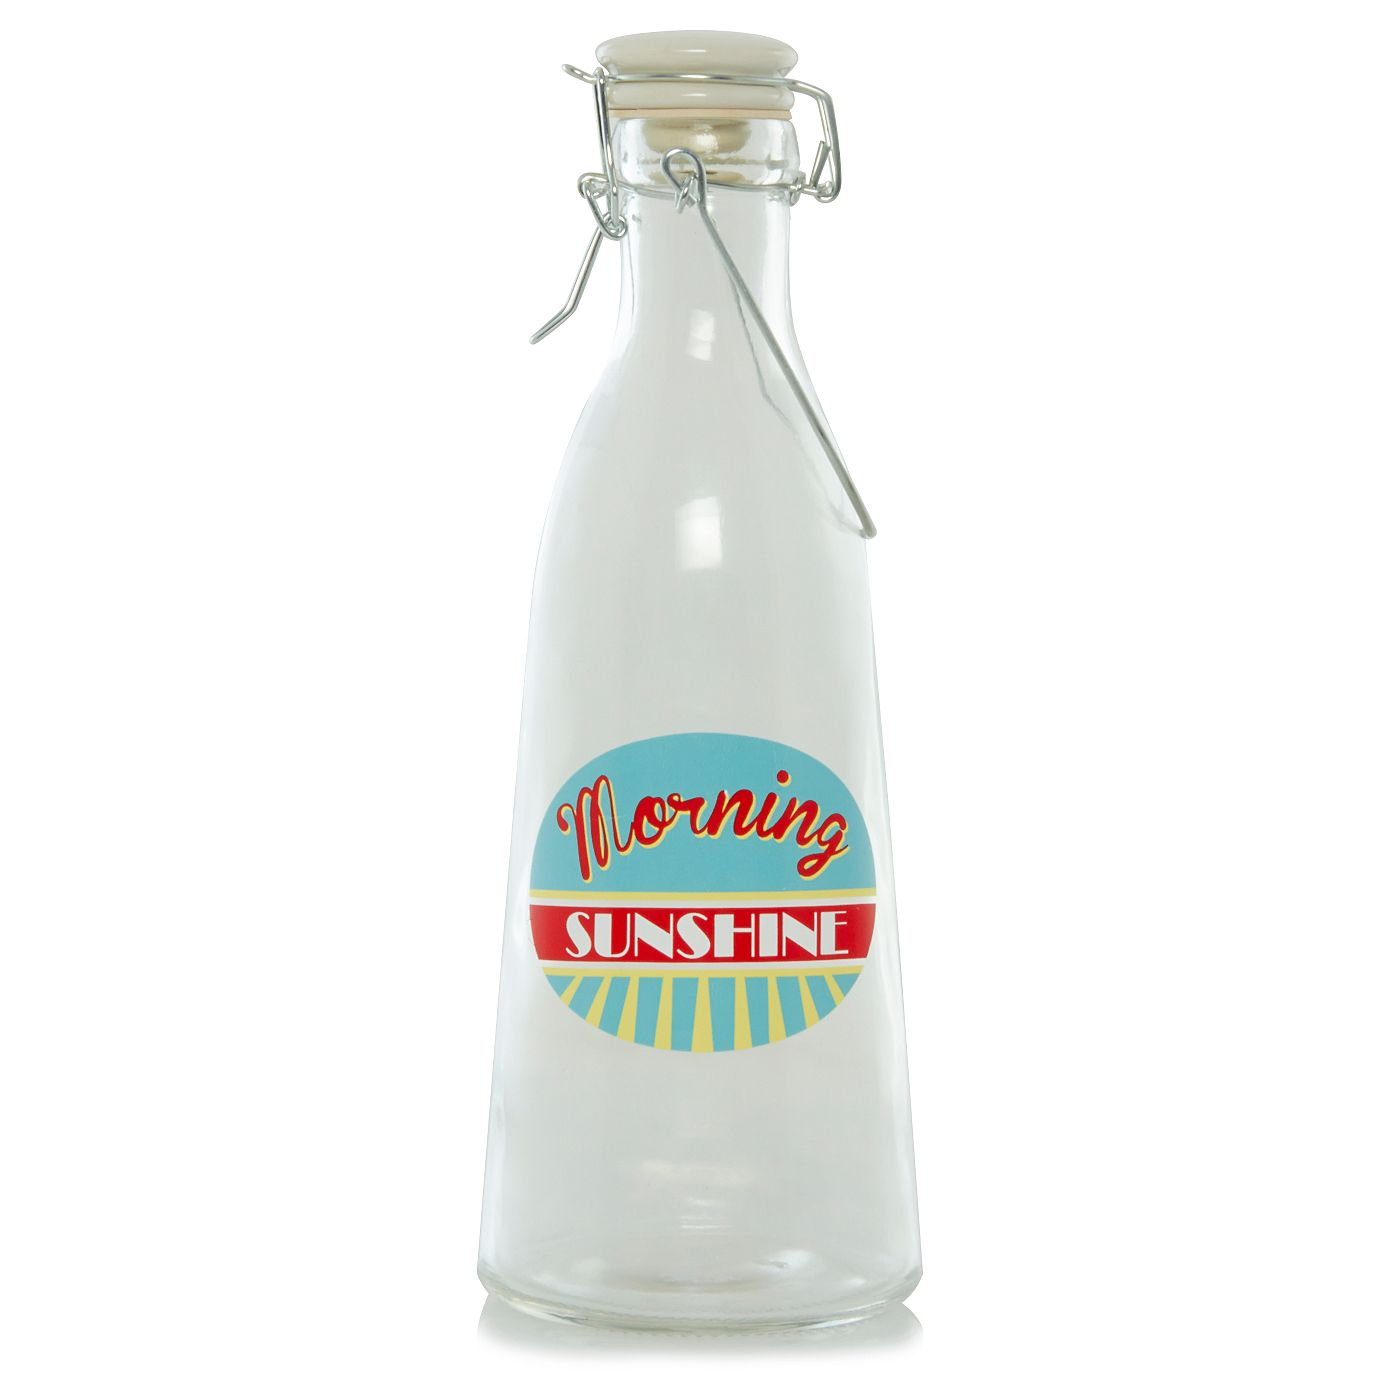 George Home Fresh Milk Bottle Farm Fresh Asda Direct Maison